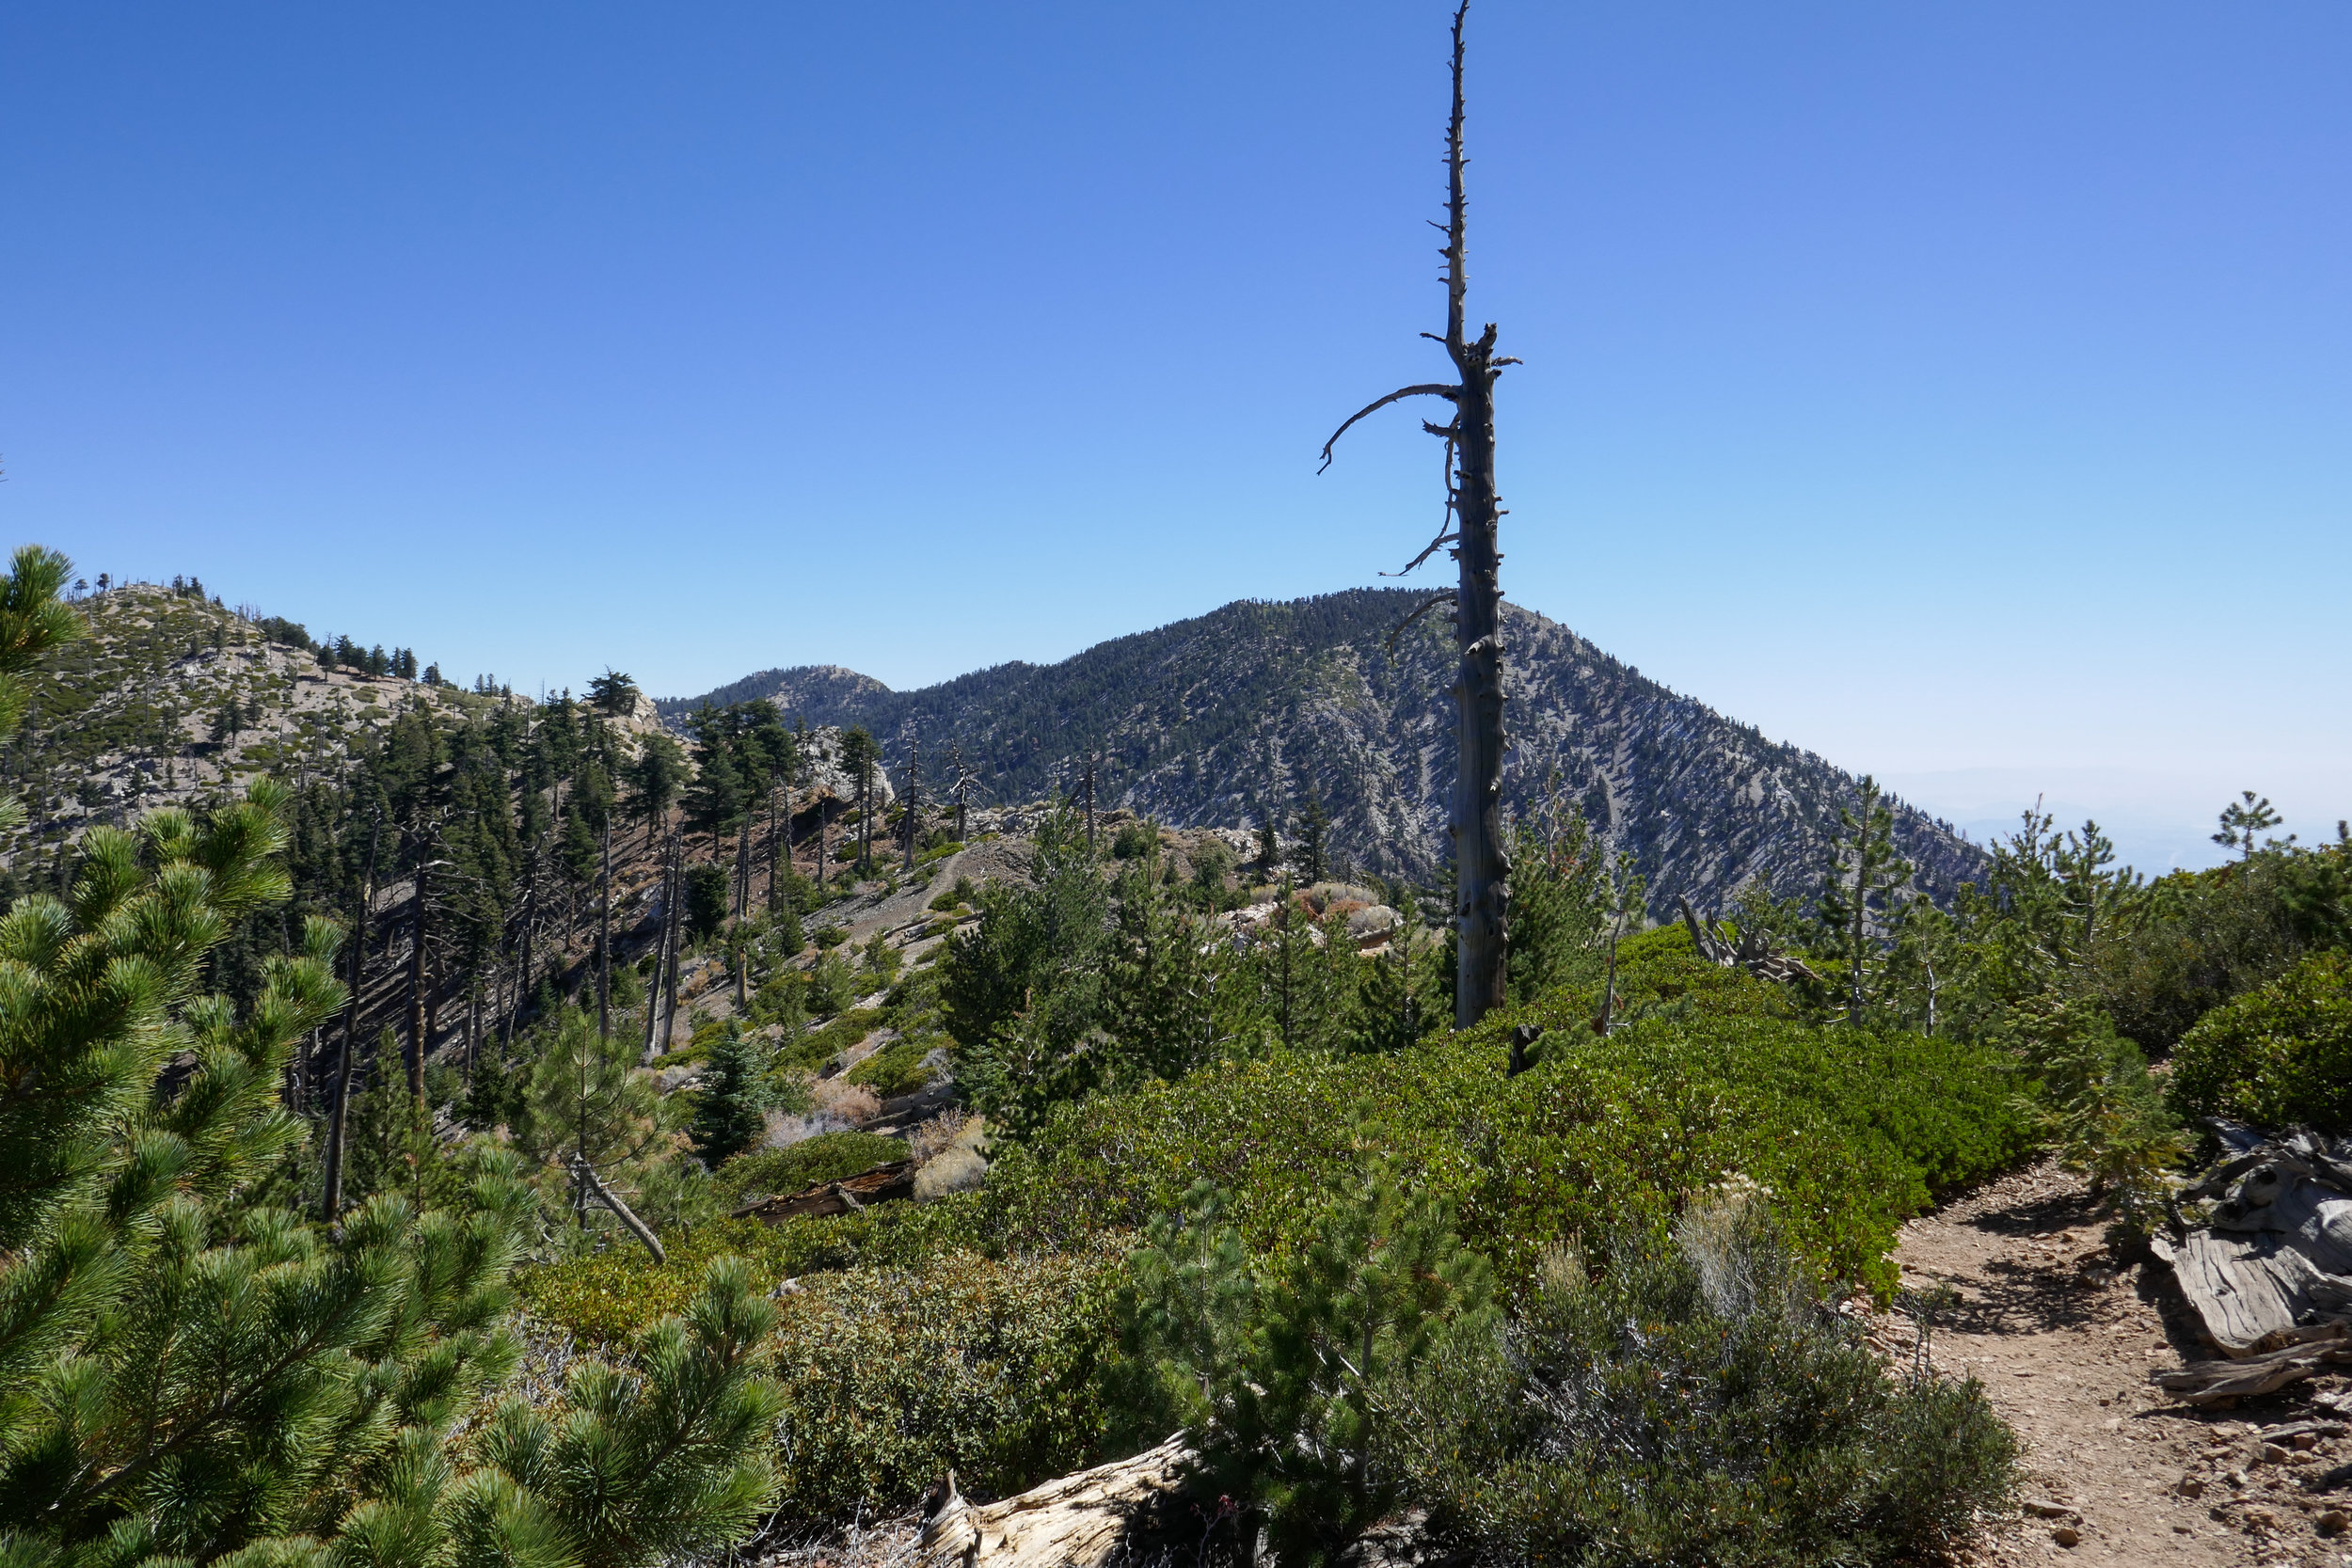 Looking across the ridge.